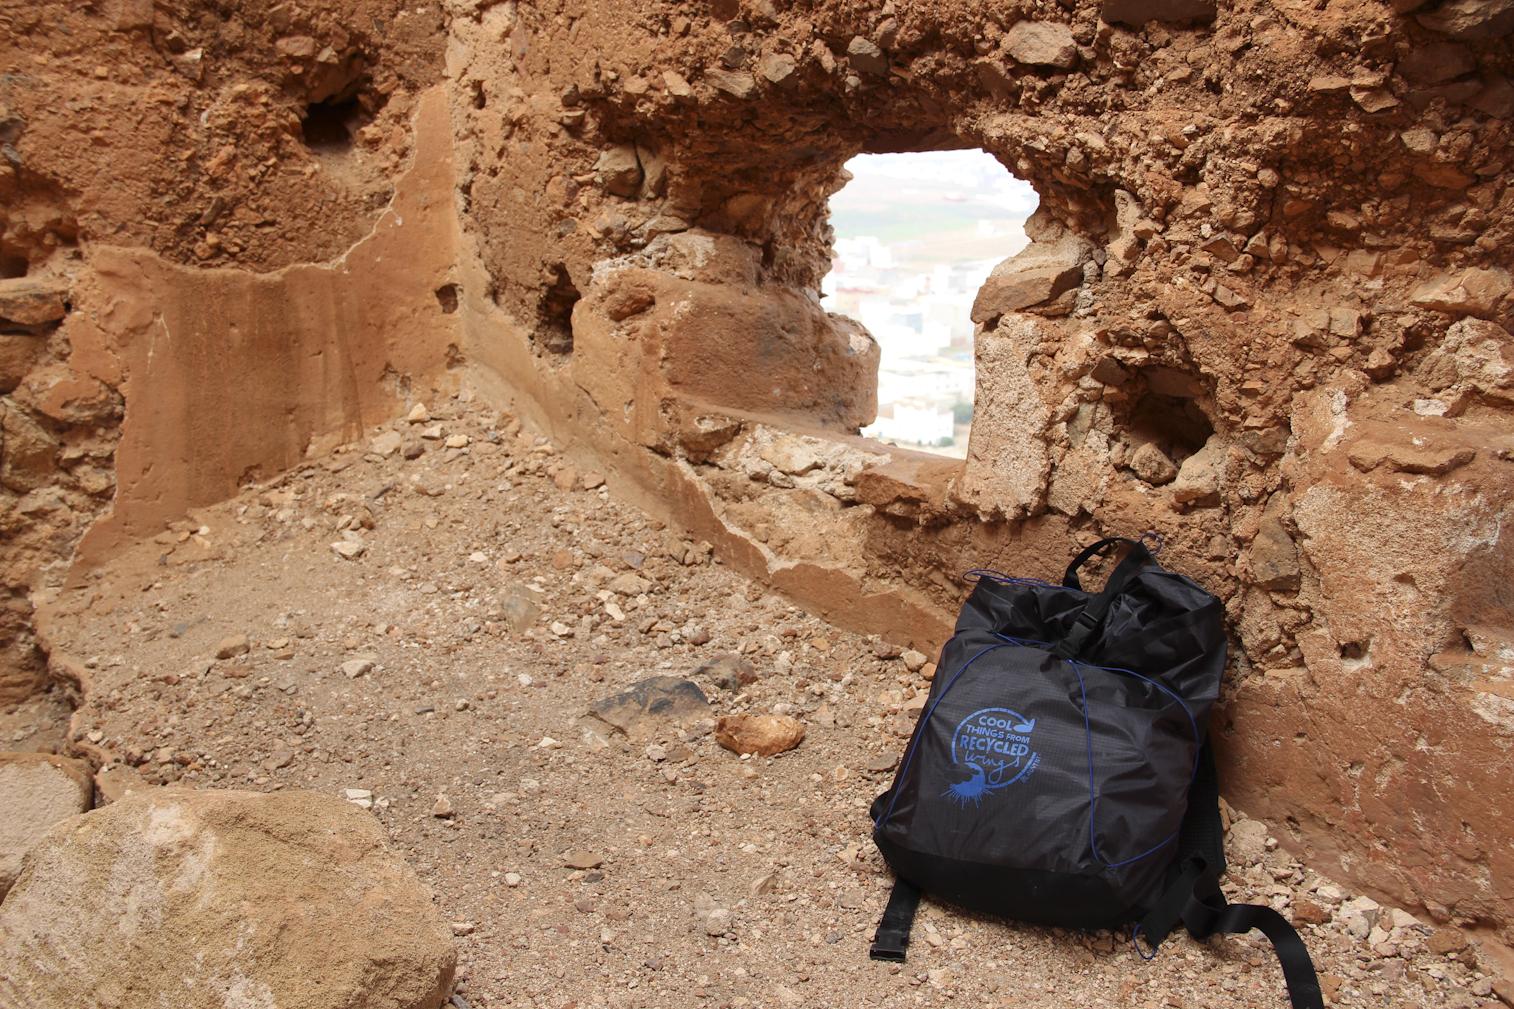 doyouwanna in Morocco